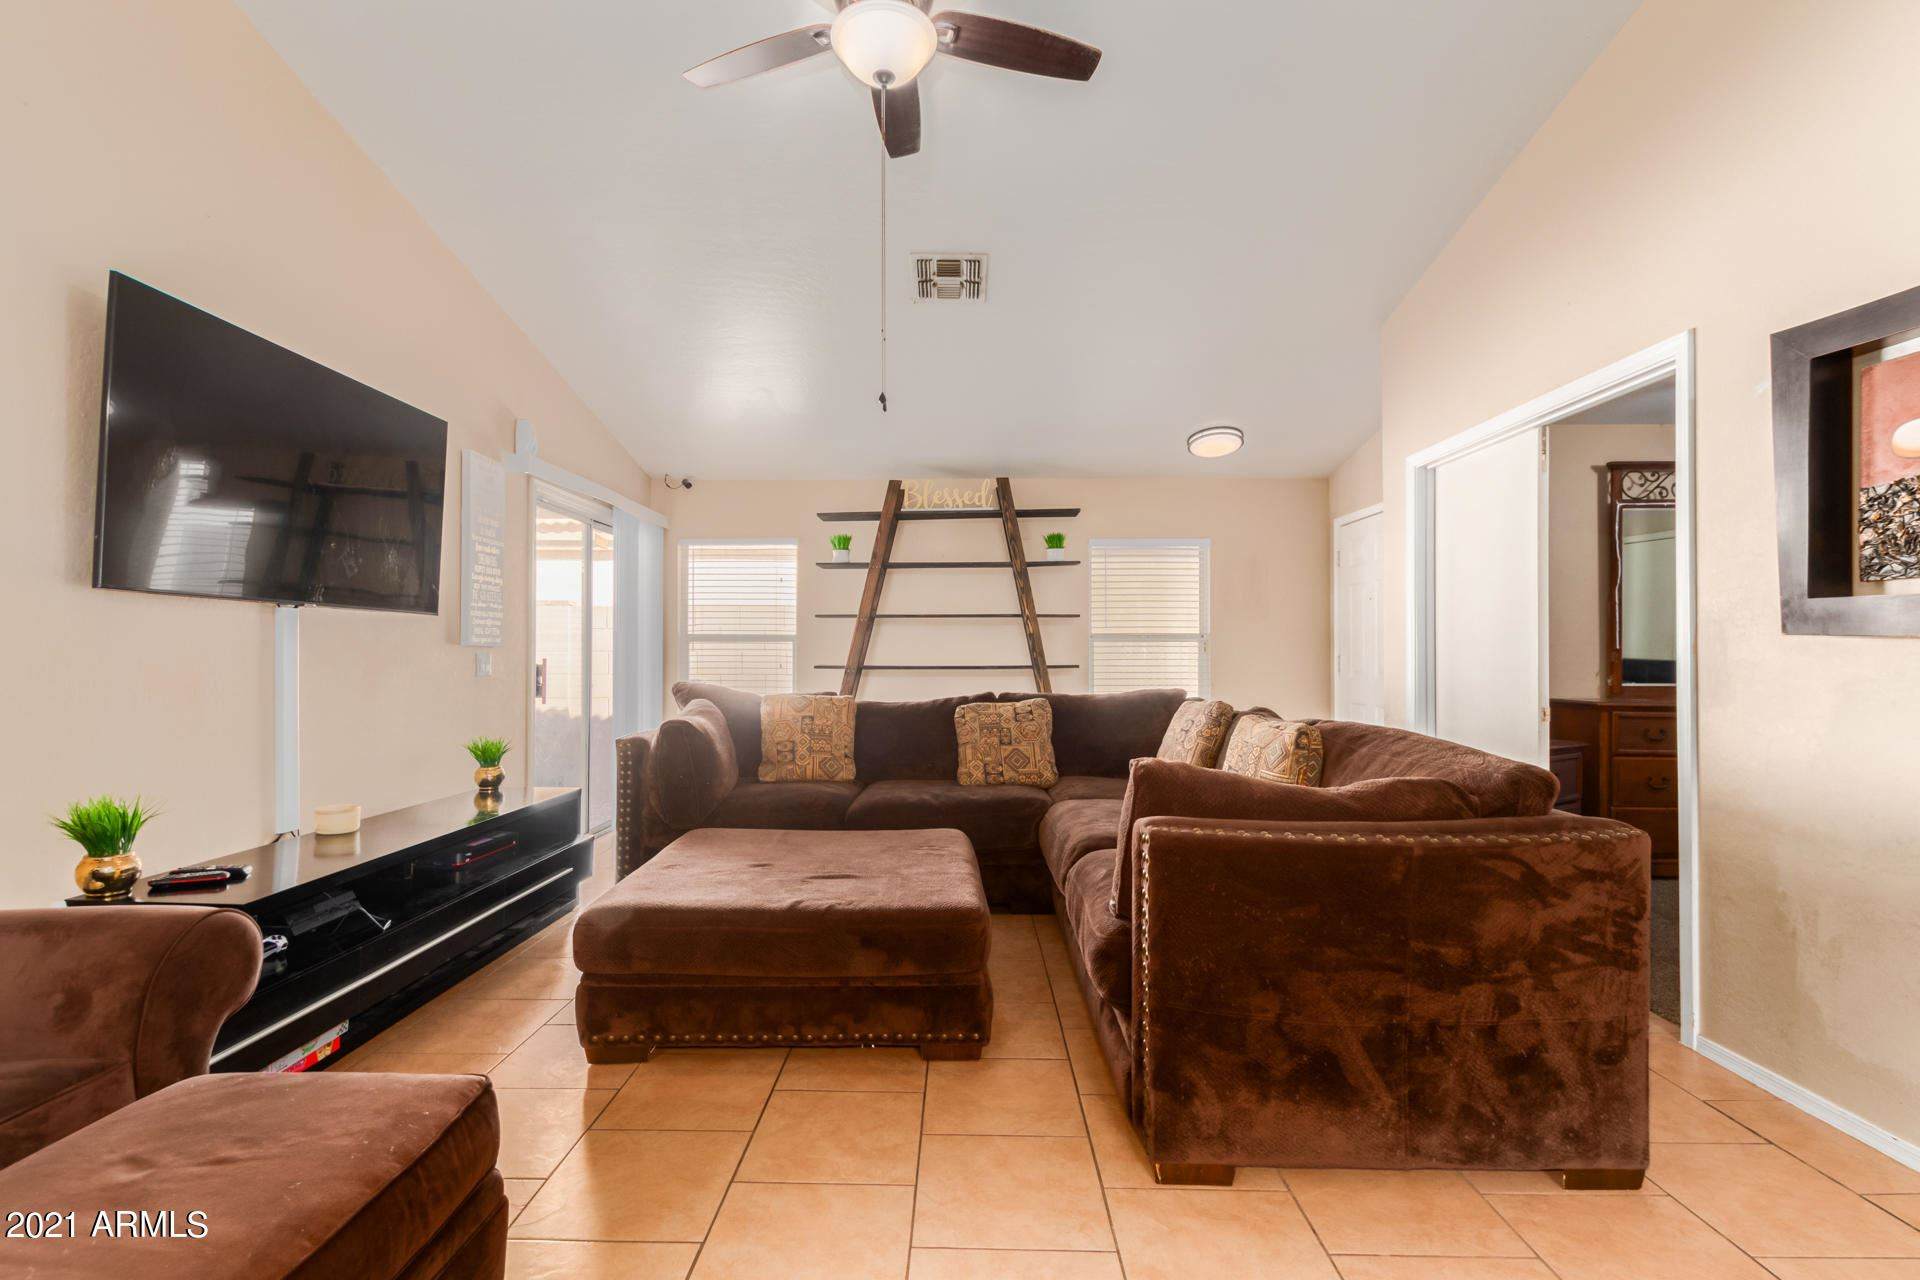 Photo of 11954 W BERKELEY Road, Avondale, AZ 85392 (MLS # 6199820)